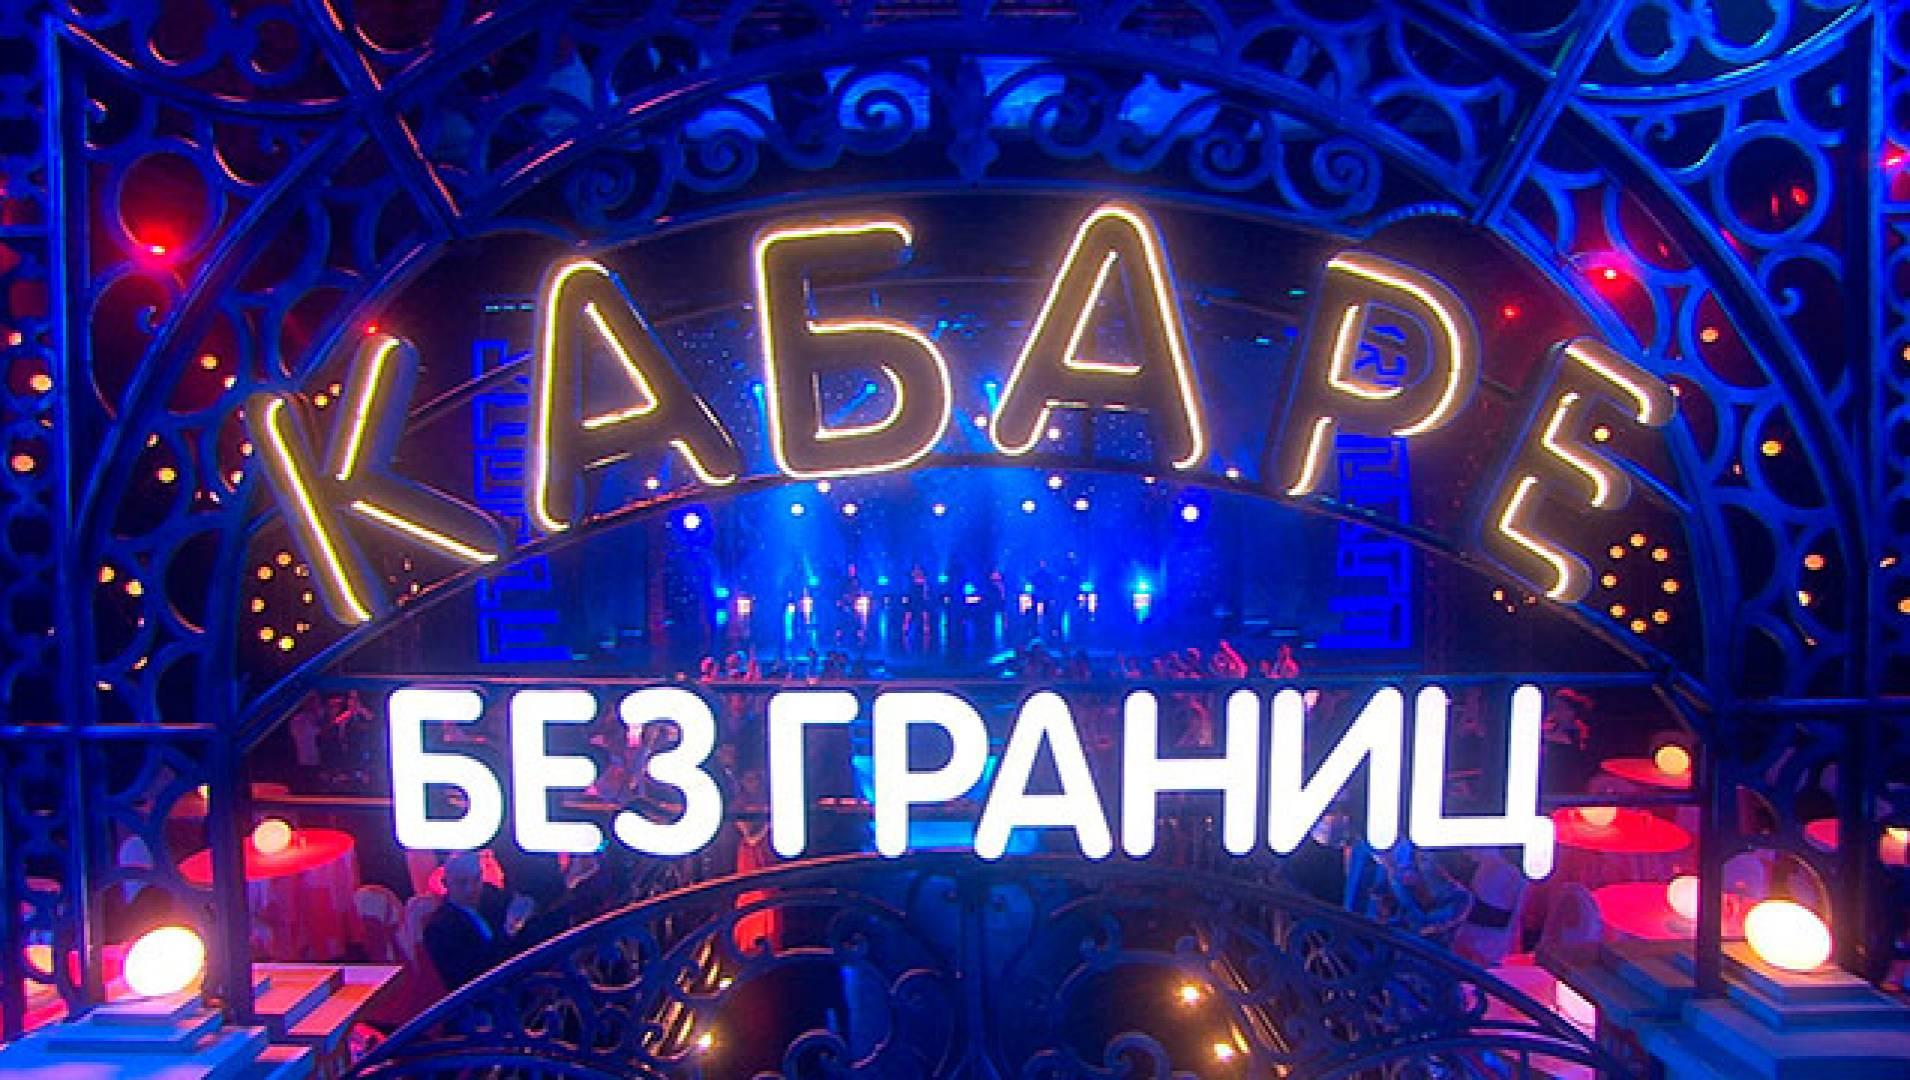 Кабаре без границ - ТВ-шоу